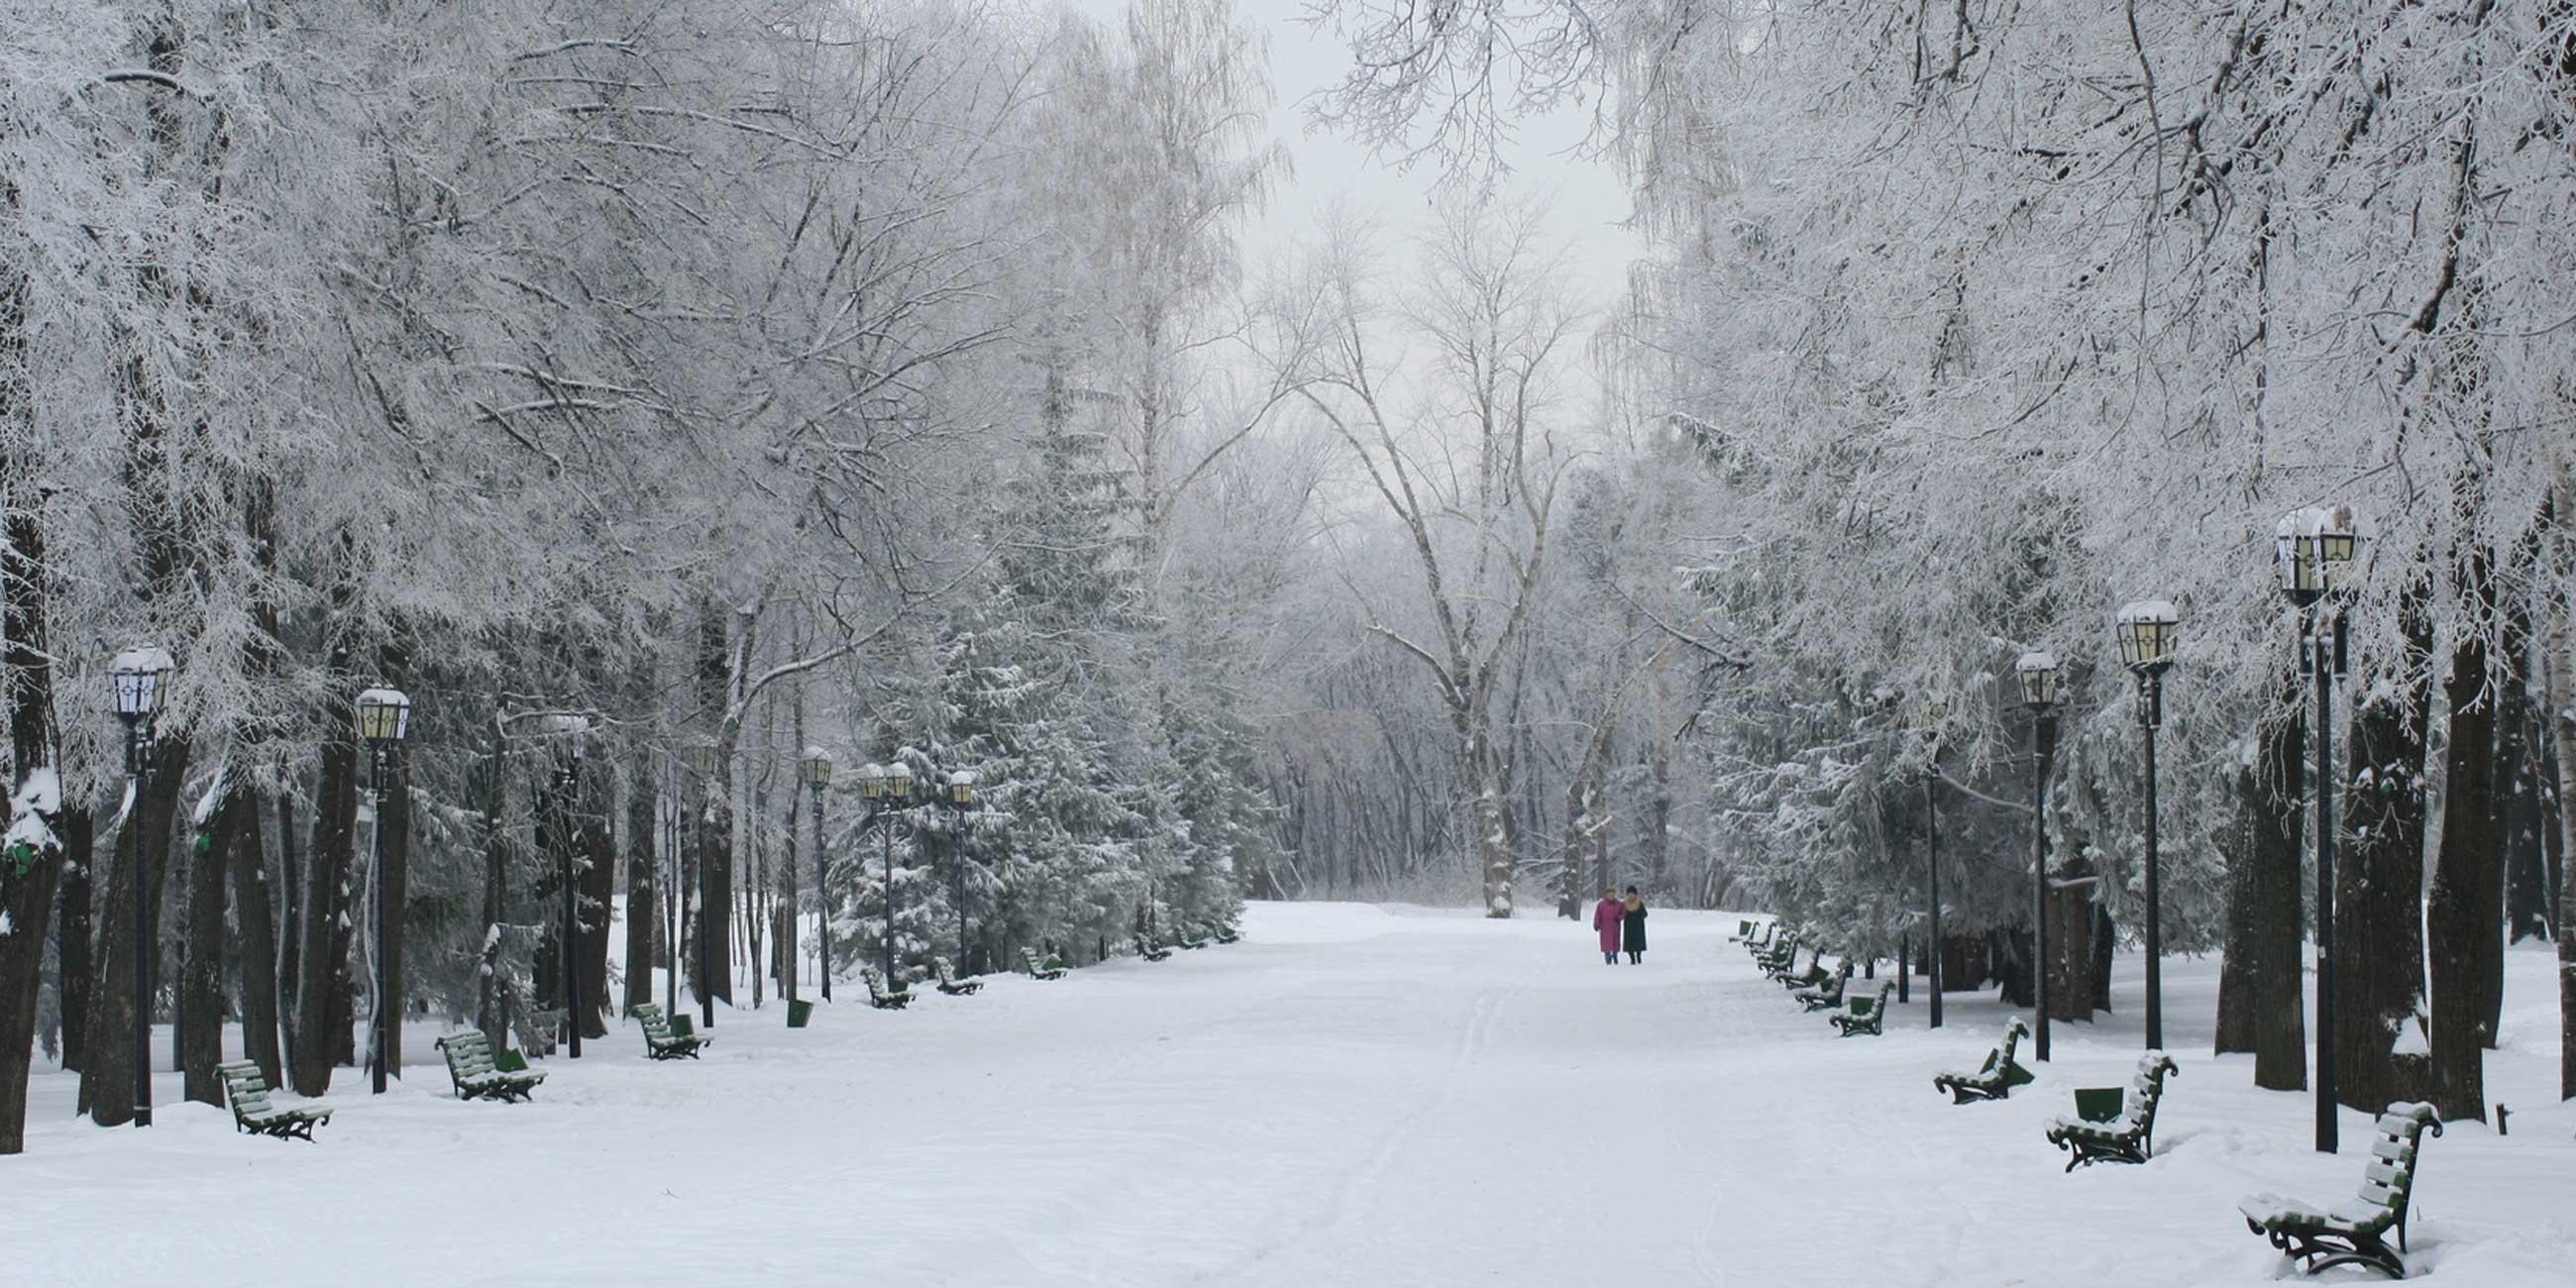 Зимой заснеженный парк имени Горького особенно красивФото: Эльвира Максимова, lori.ru